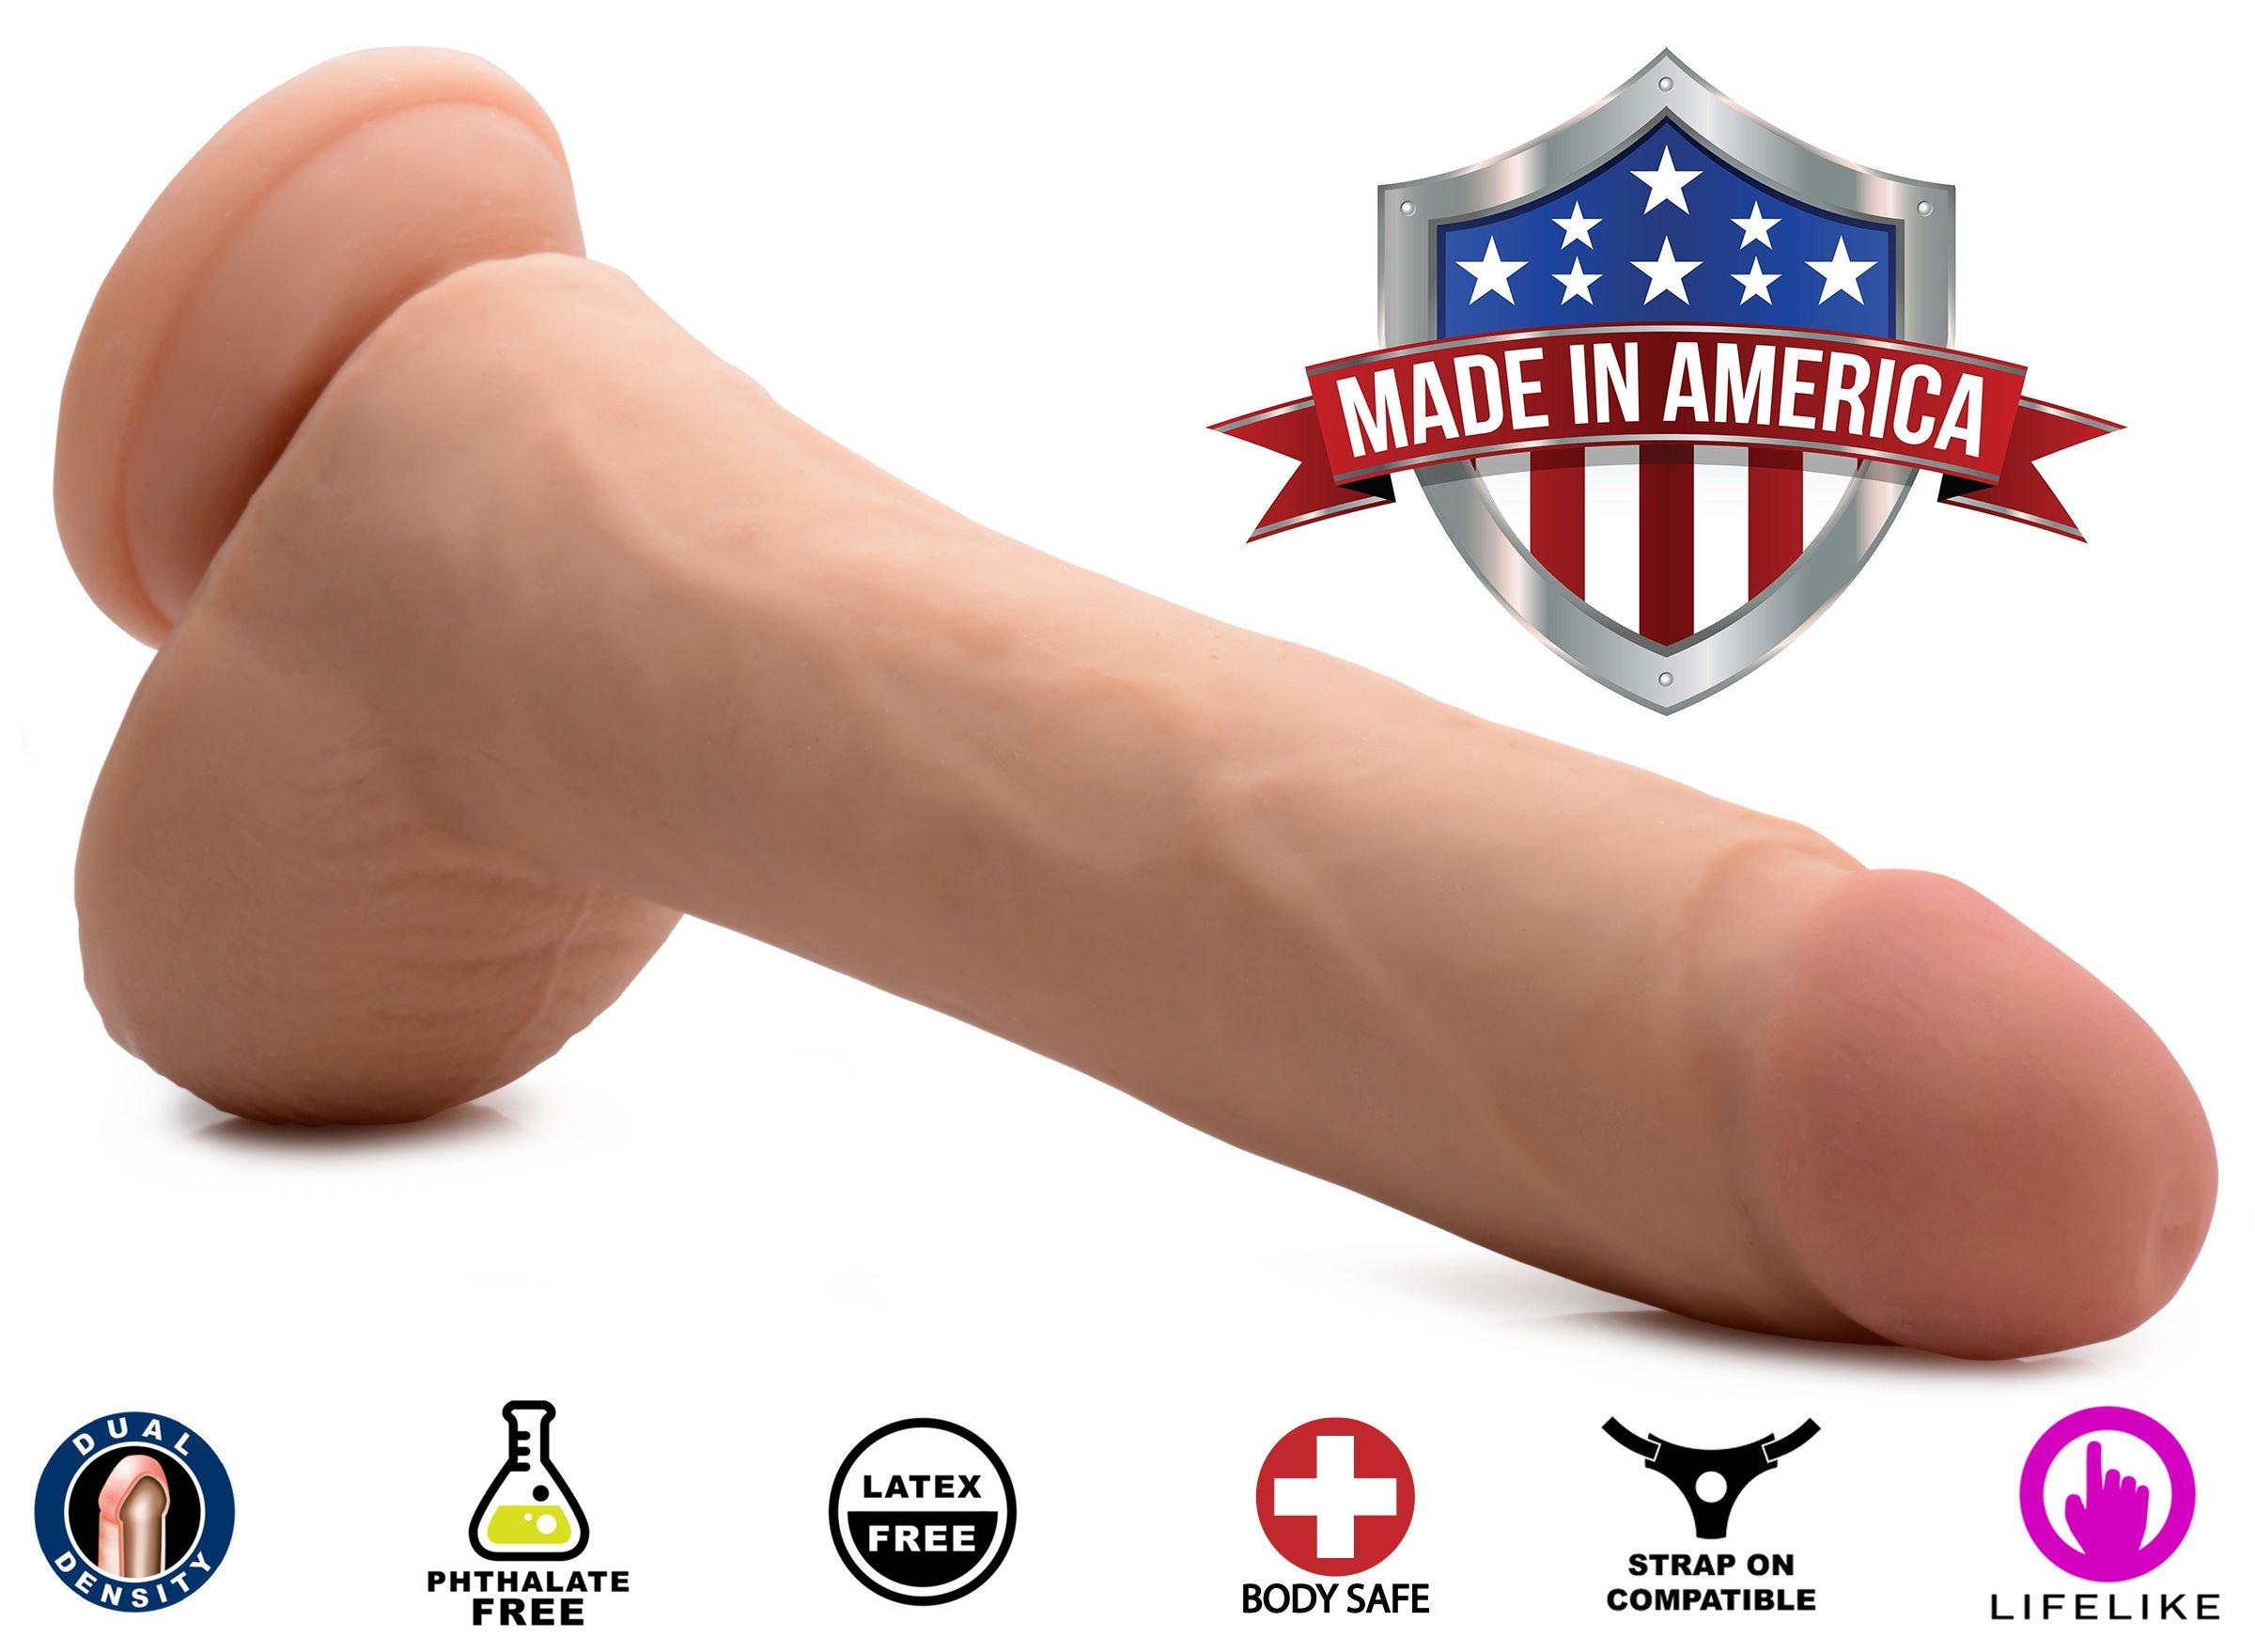 Nipple big free breast movies